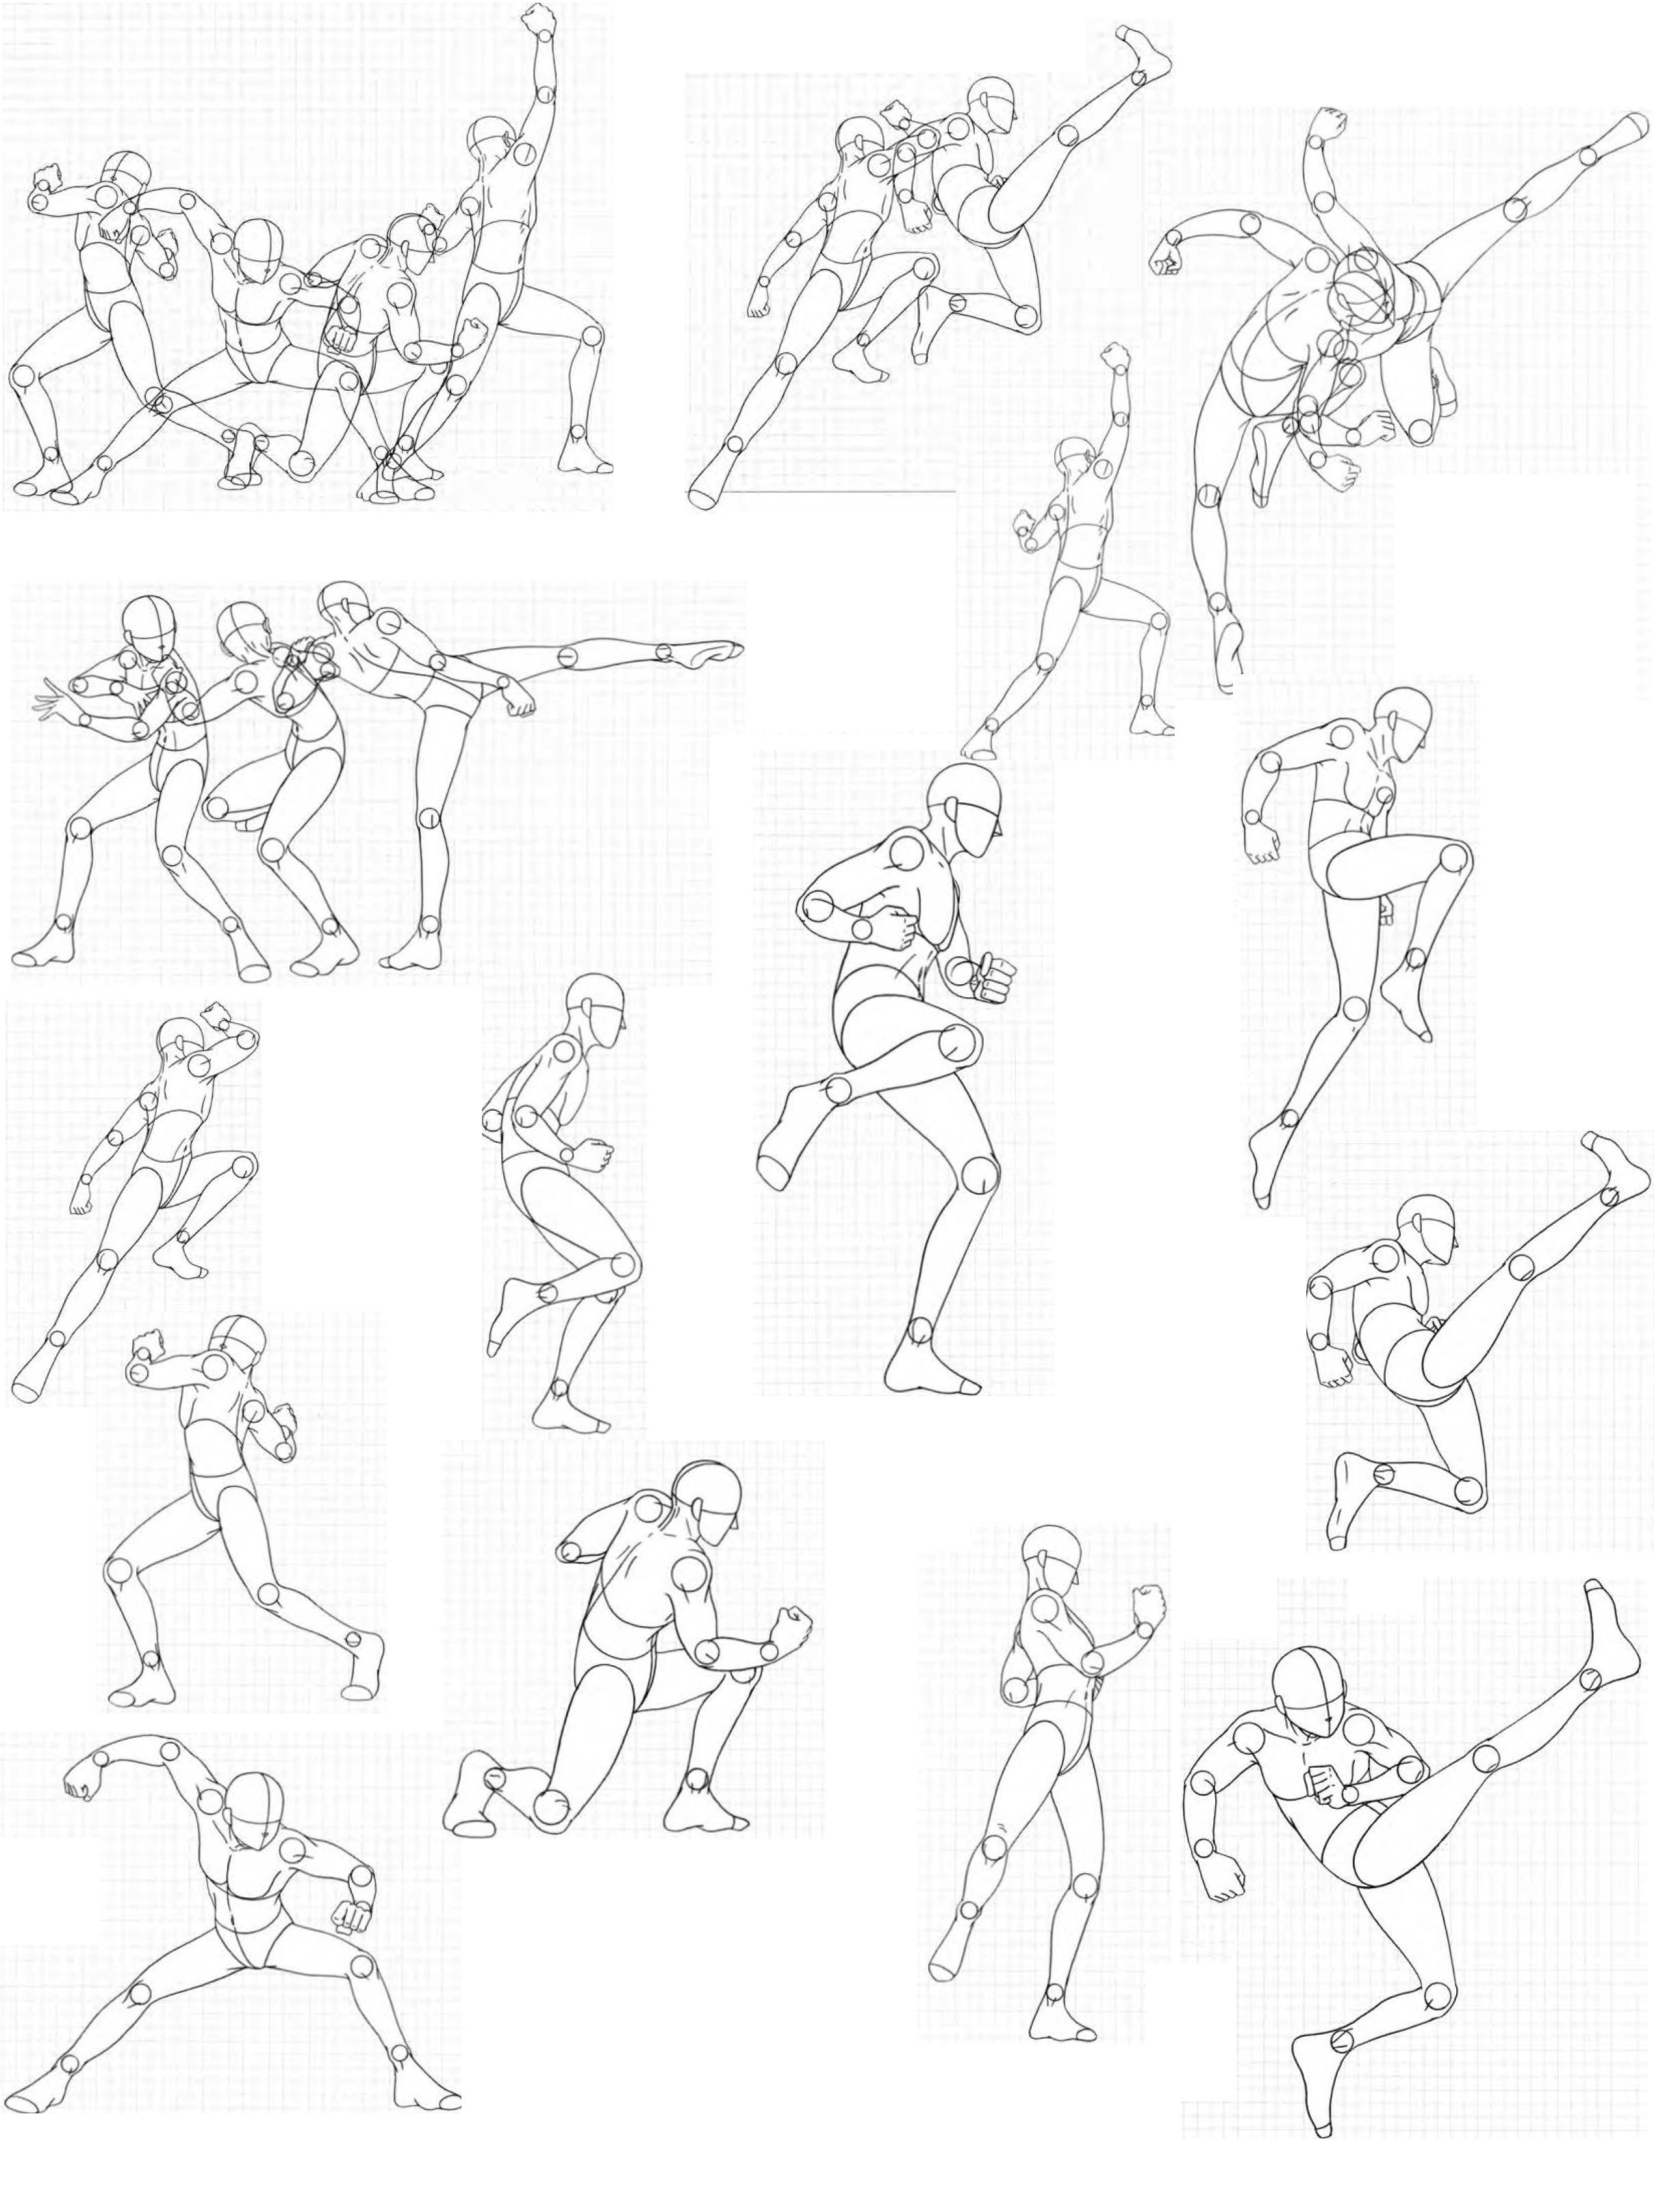 Virgin Bo S 12 By Fvsj On Deviantart Gt Gt Action Pose Reference Sheet For Anime Manga